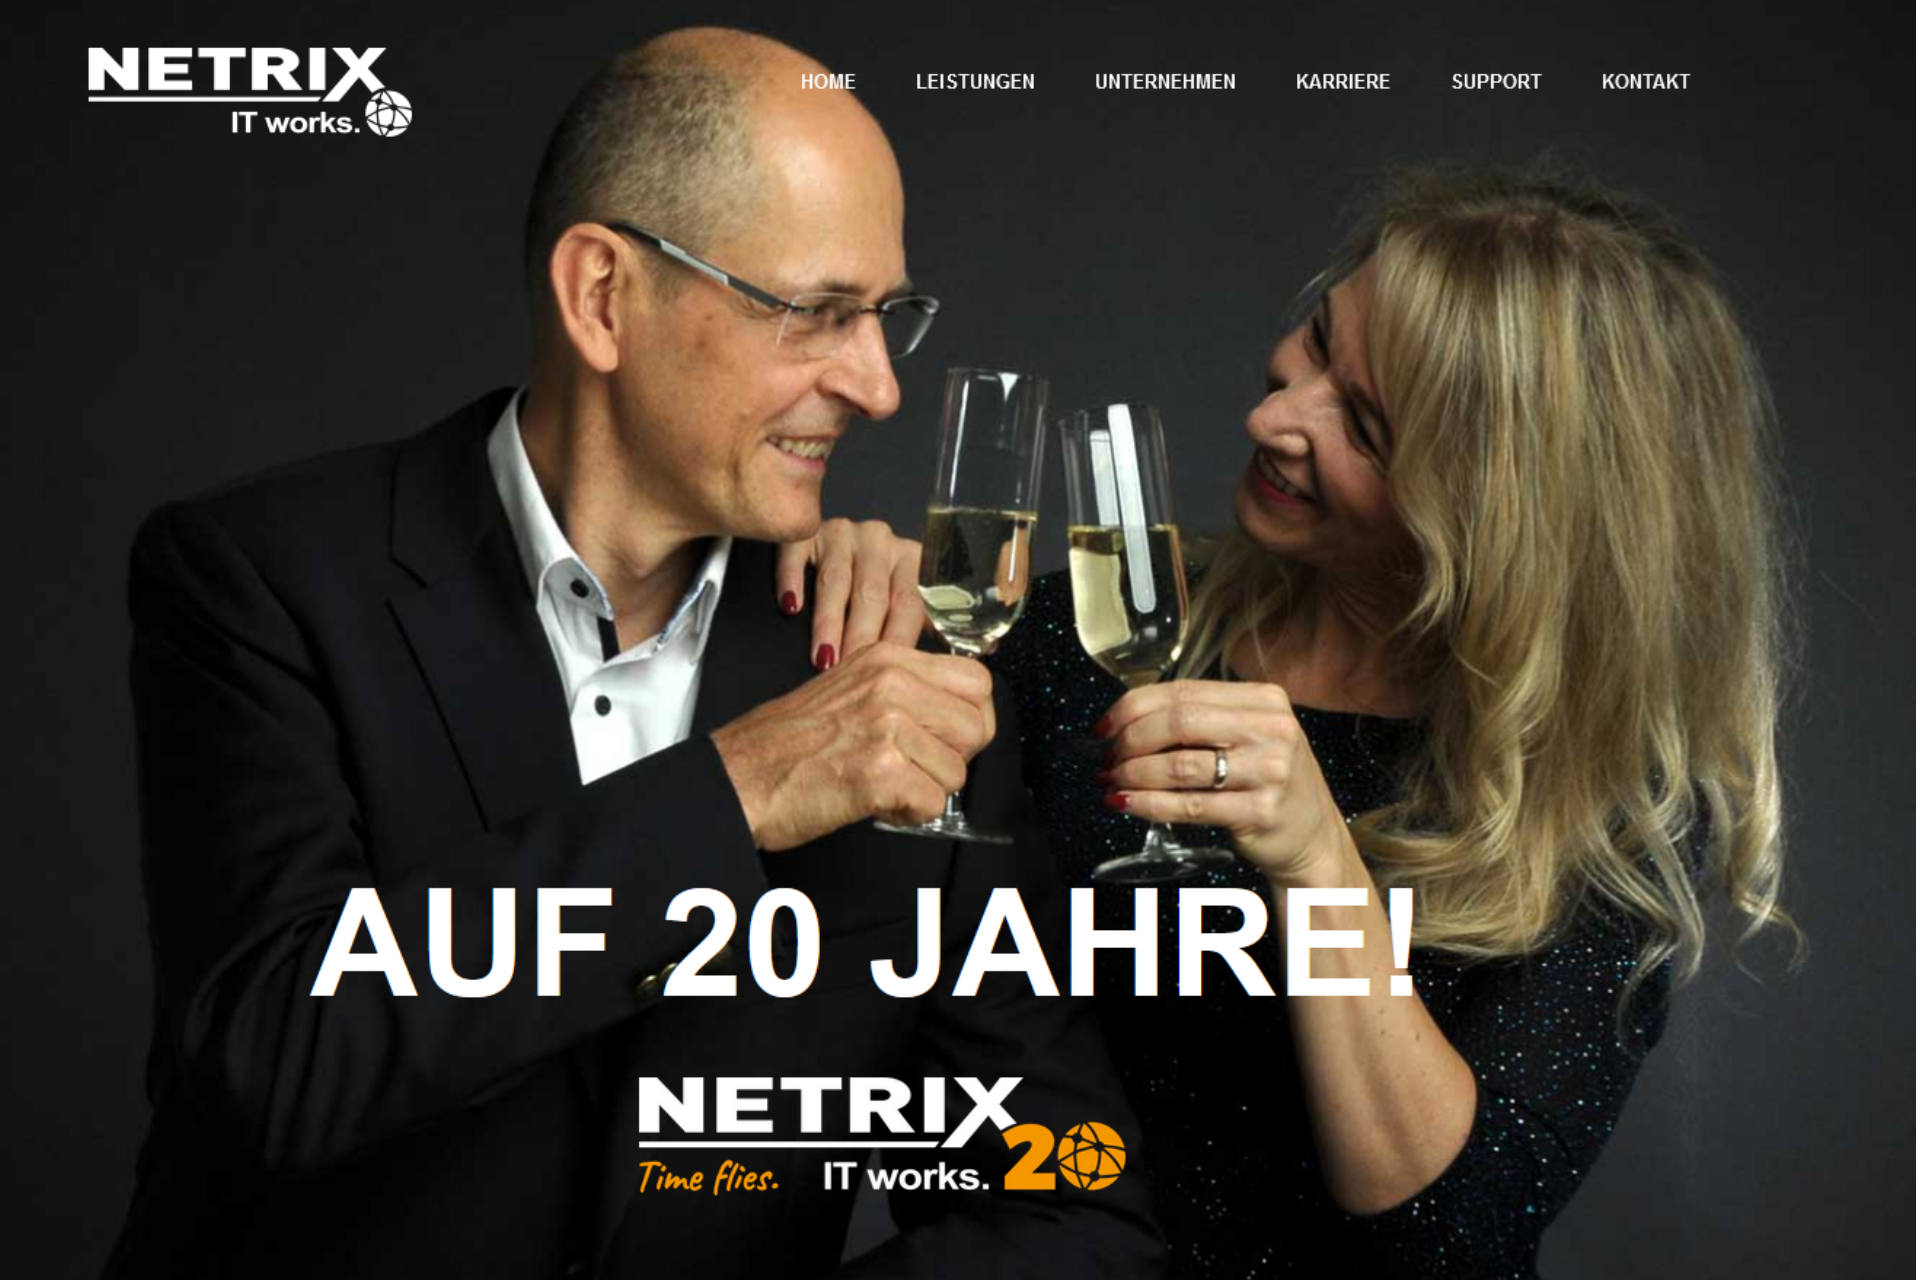 20 Jahre NETRIX